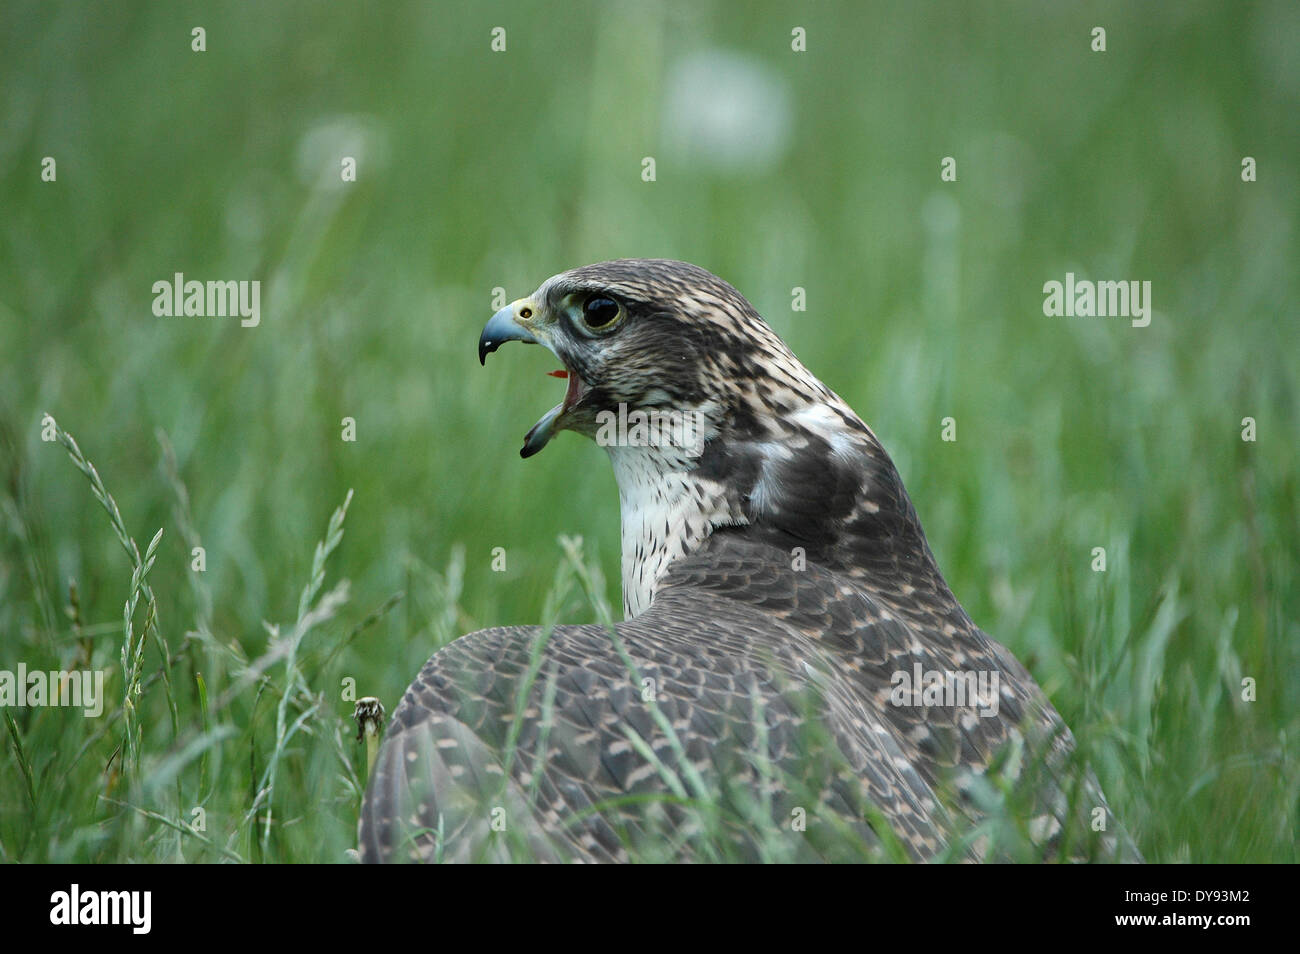 Lanner falcon, raptor, bird of prey, caracaras, Falco biarmicus, birds, animal, animals, Germany, Europe, - Stock Image